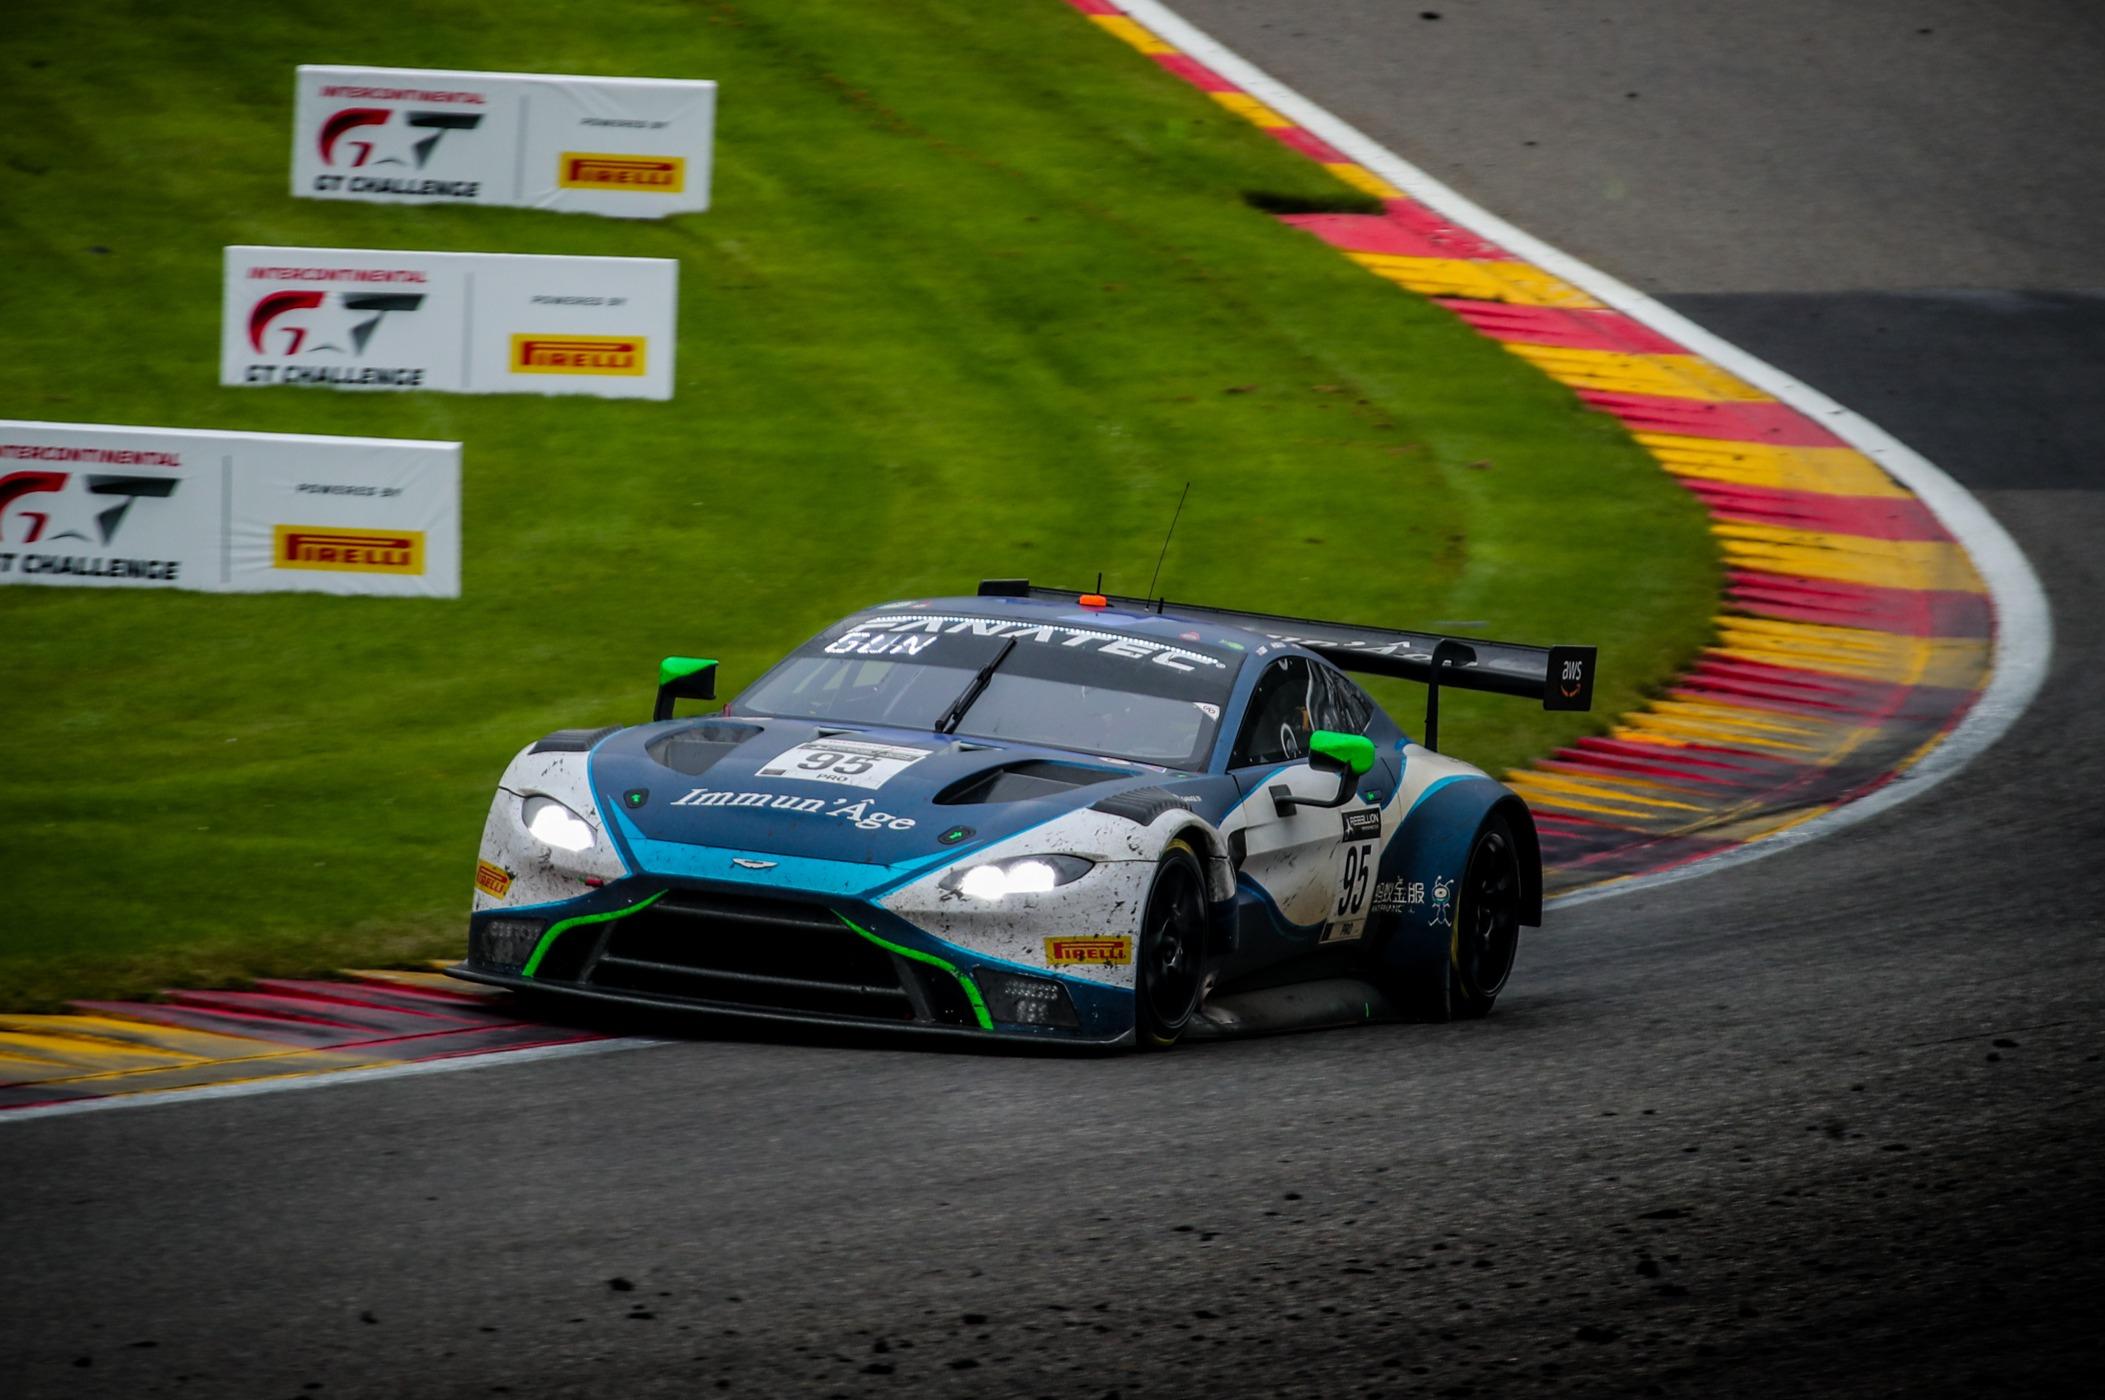 Sorensen, Thiim and Gunn are back on the lead lap in Pro class Garage 59 Aston